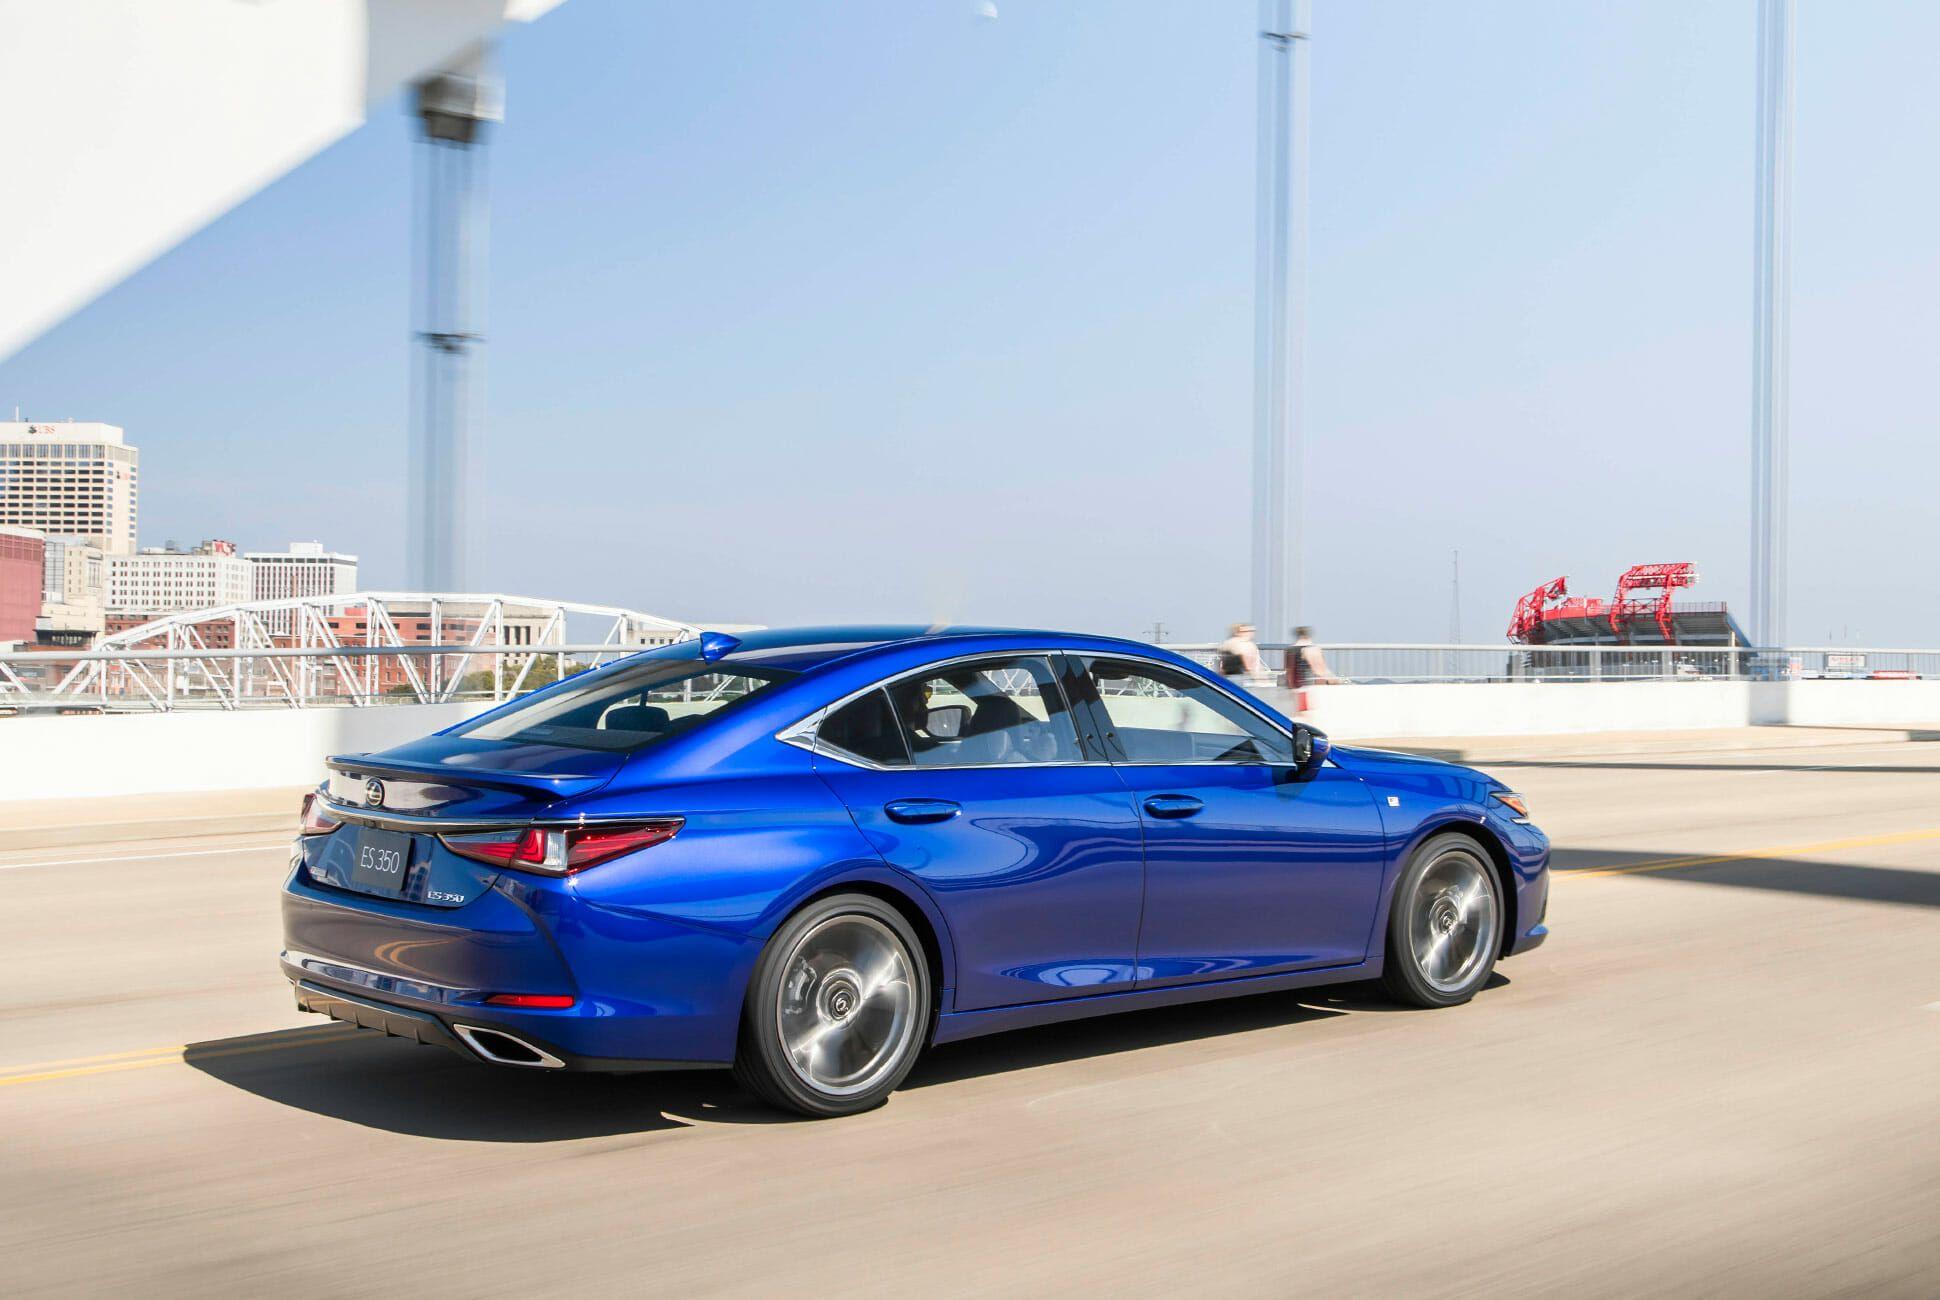 2019-Lexus-ES-350-F-Sport-Review-gear-patrol-slide-8